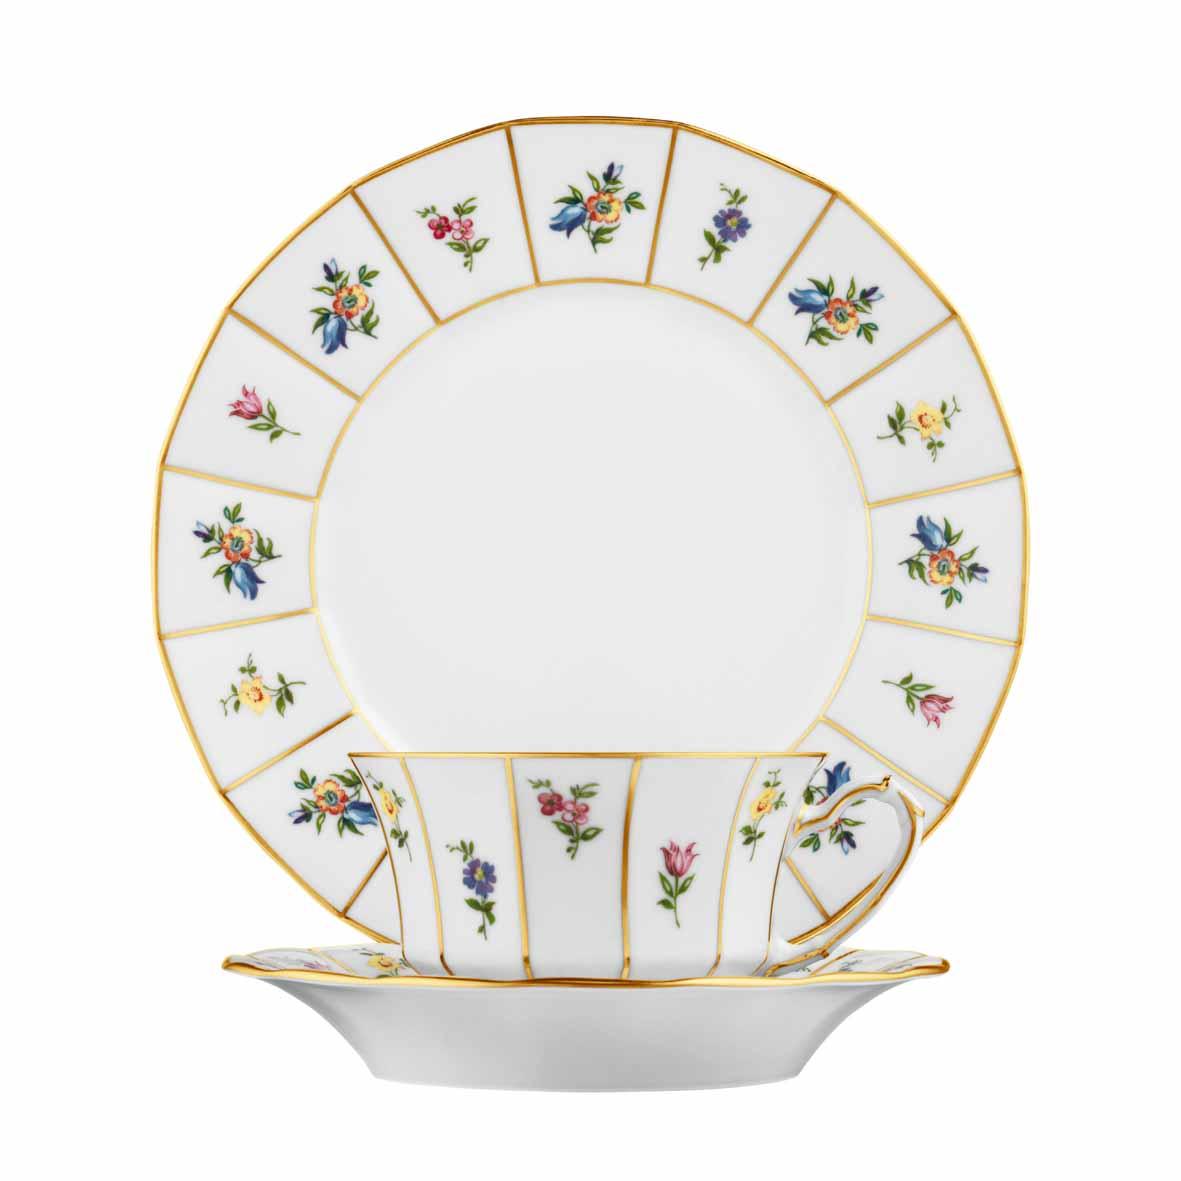 Breakfast plate, cup and saucer form Grecque pattern Mille Fleurs by FÜRSTENBERG